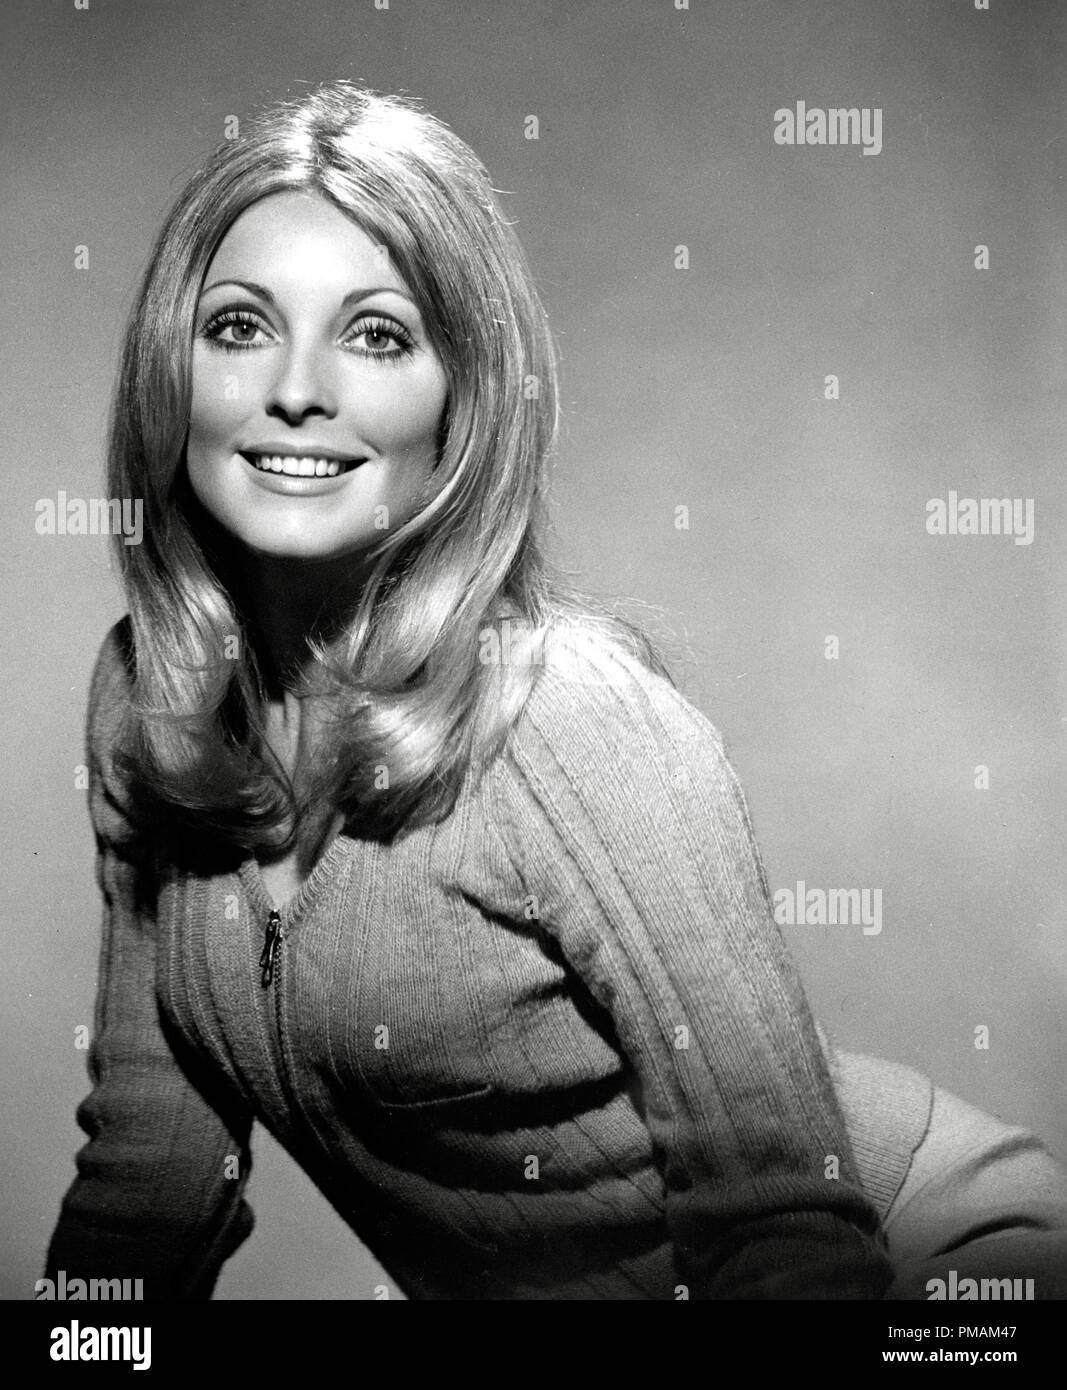 Forum on this topic: Princess Ryan (b. 1989), sharon-cuneta-b-1966/